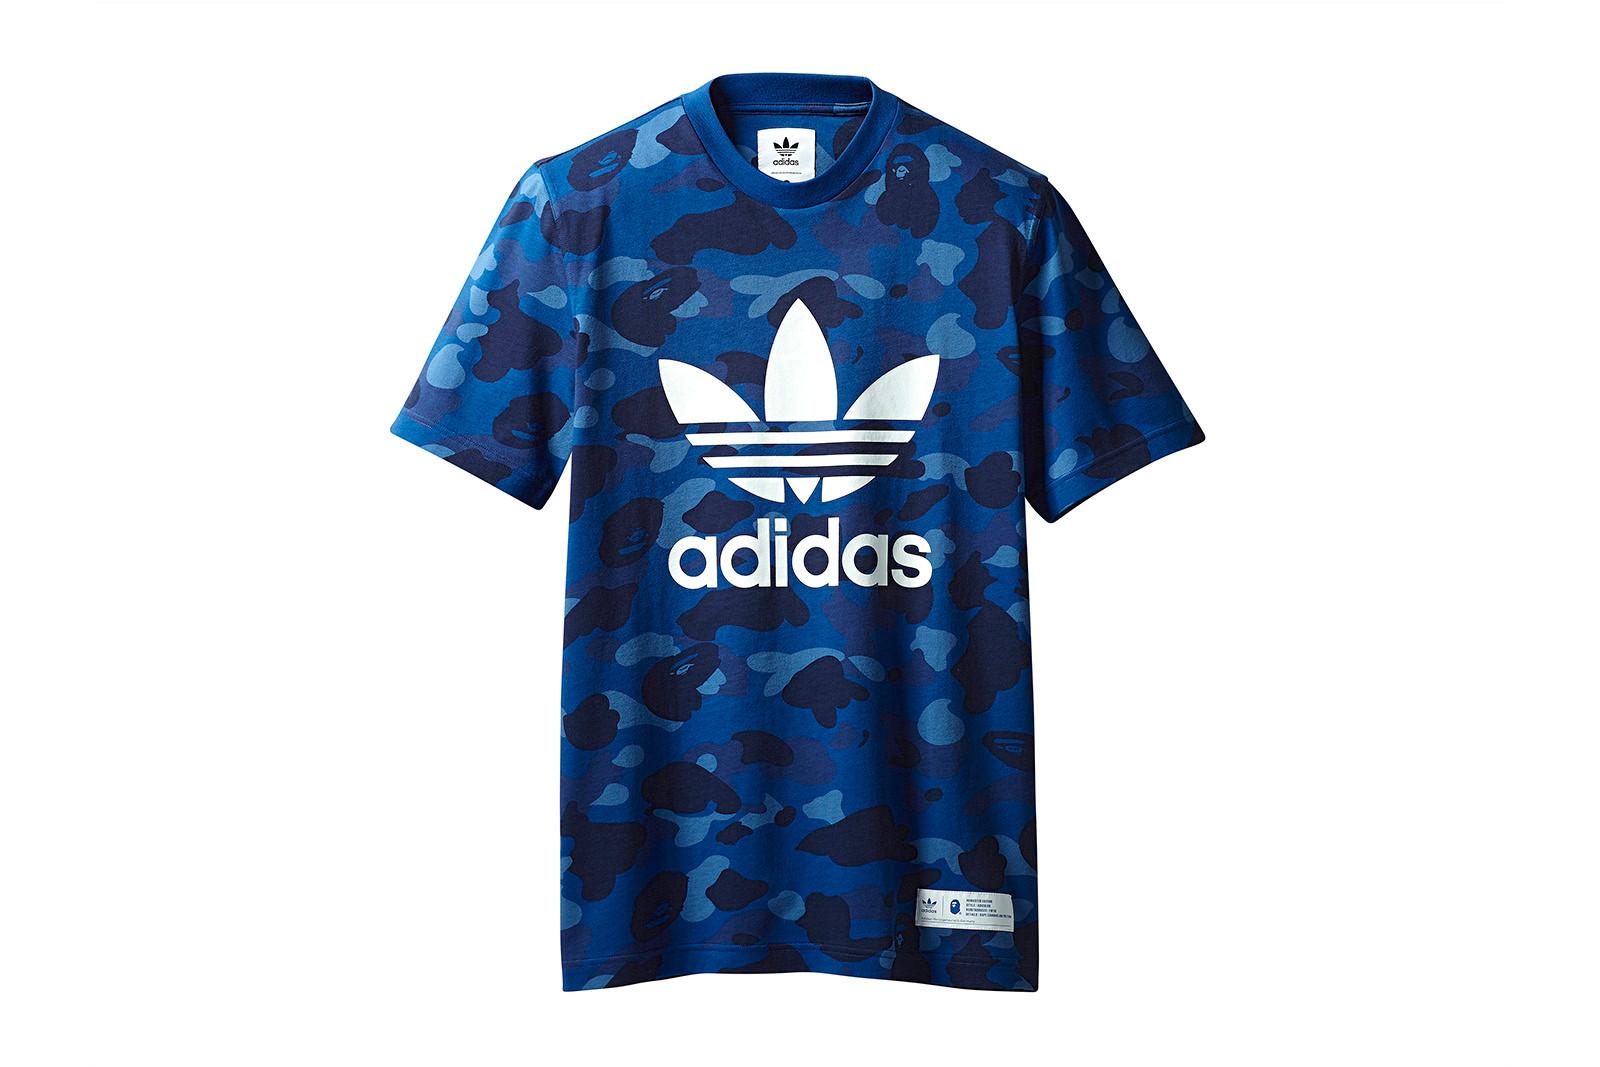 Adidas Outlet Piding - Sparen bei den drei Streifen